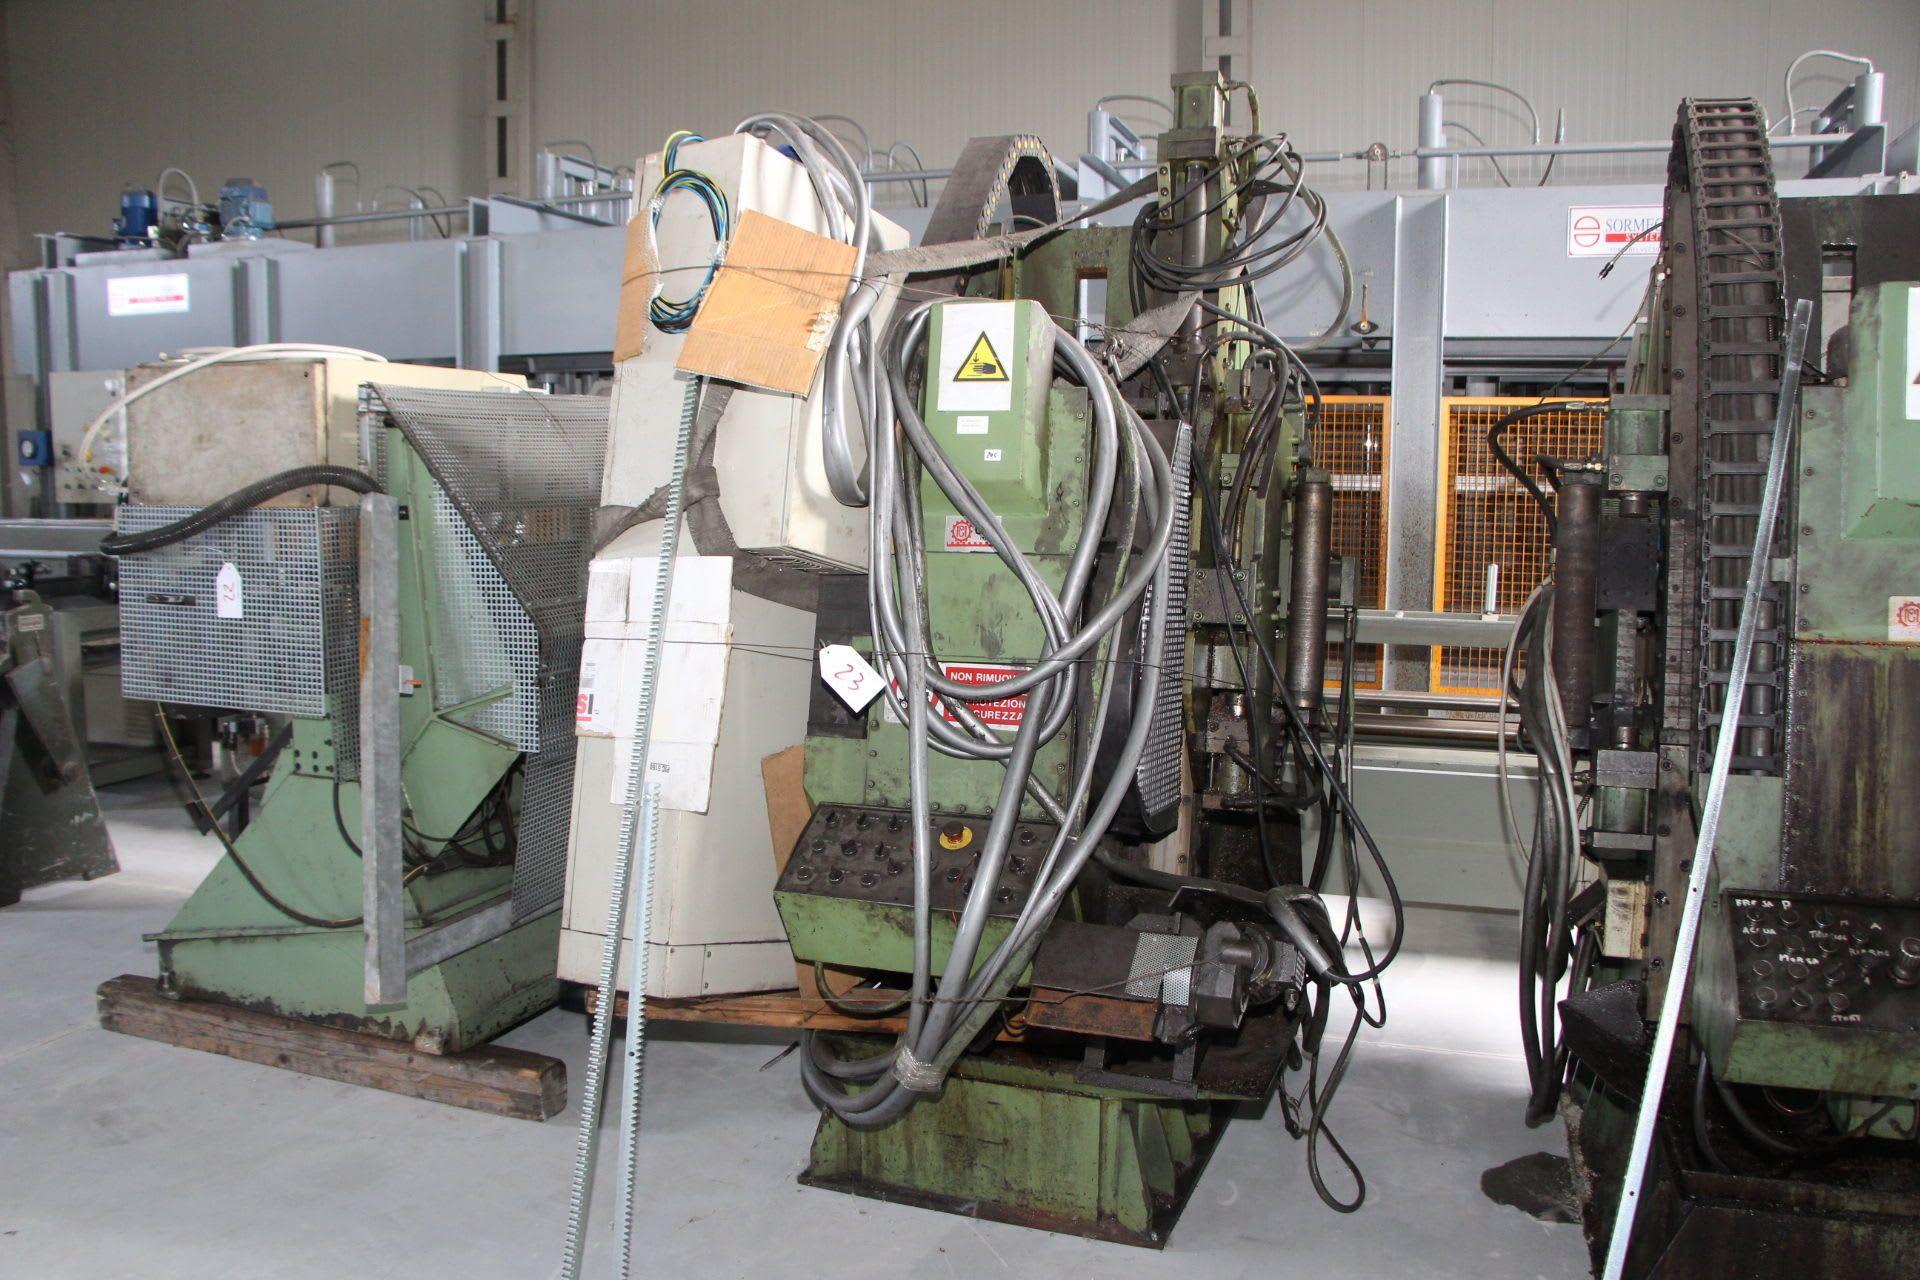 OMG 30 X 12 Abwälzfräsmaschine